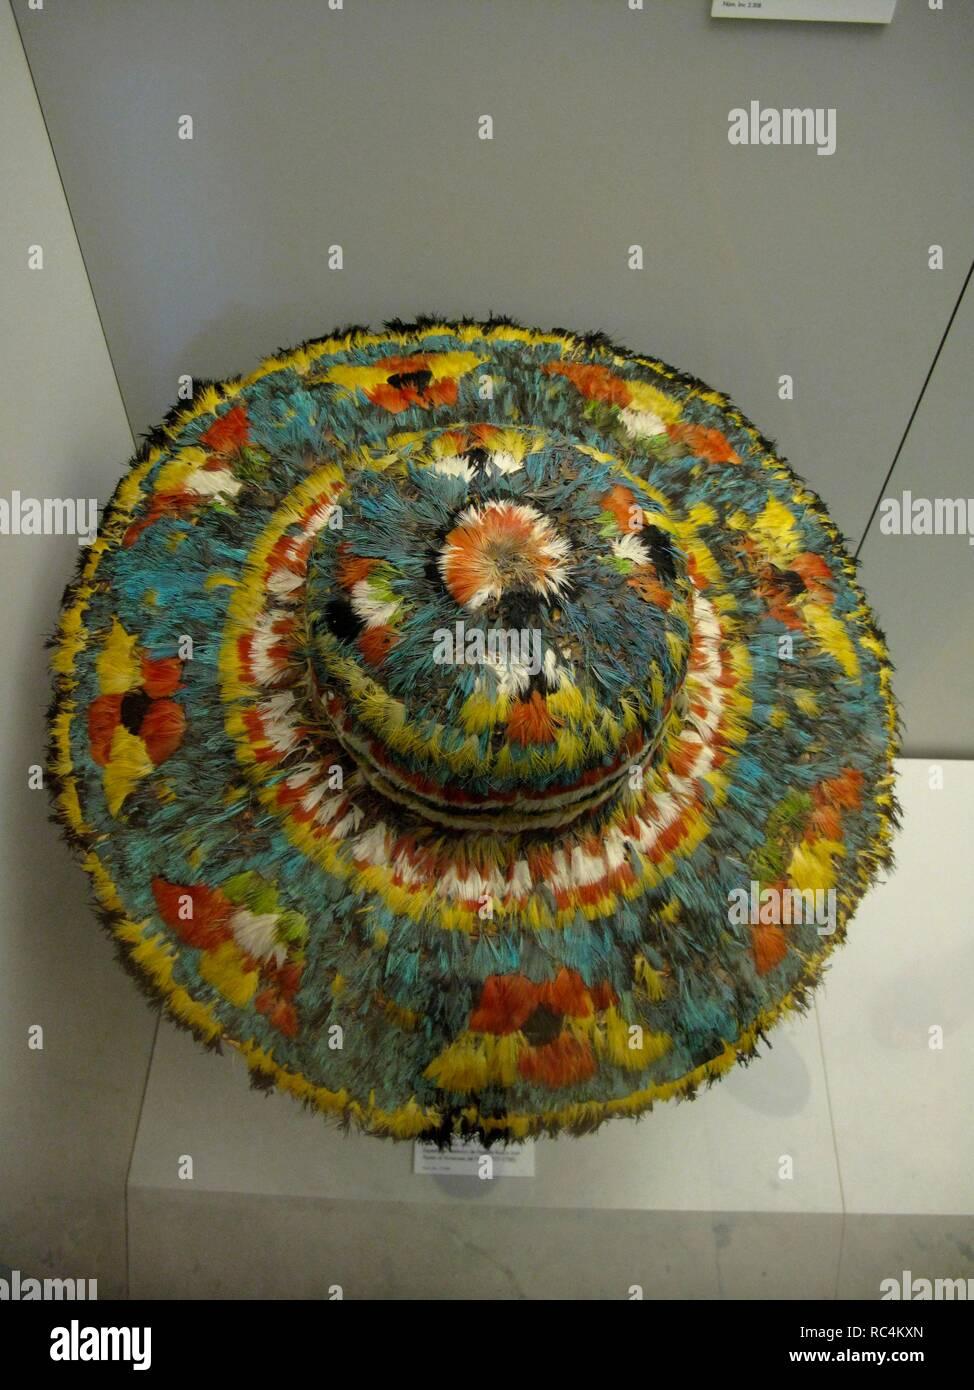 Sombrero Museum Immagini   Sombrero Museum Fotos Stock - Alamy f994732f0abc